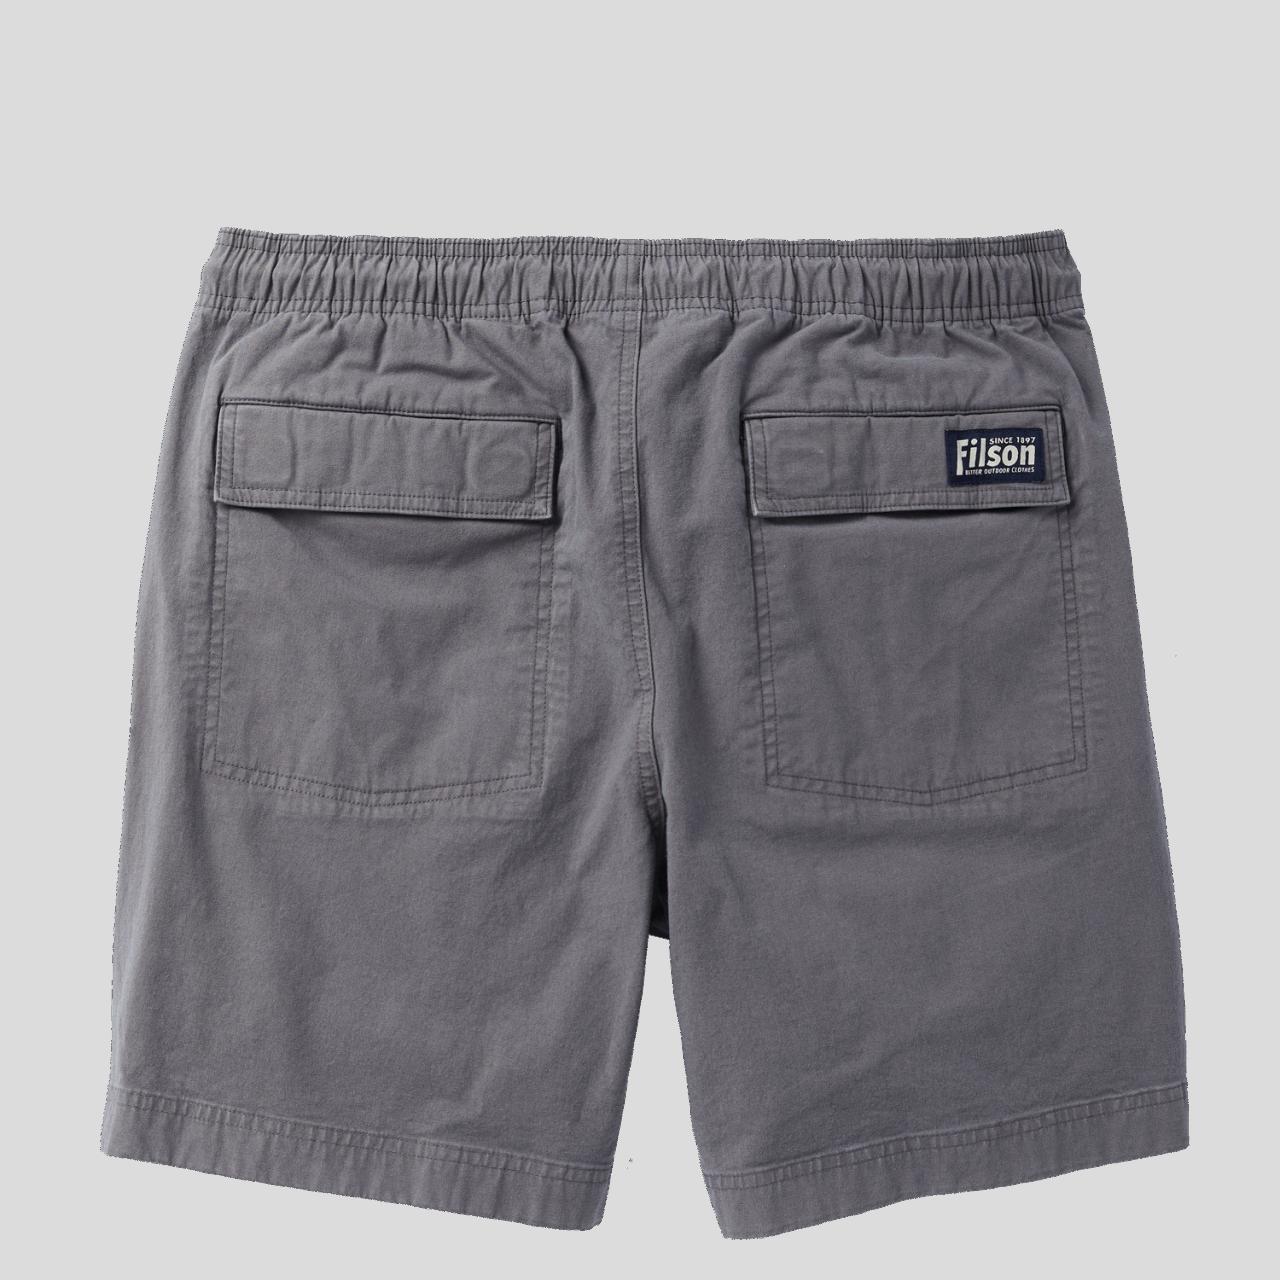 Filson Dry Falls Shorts - charcoal